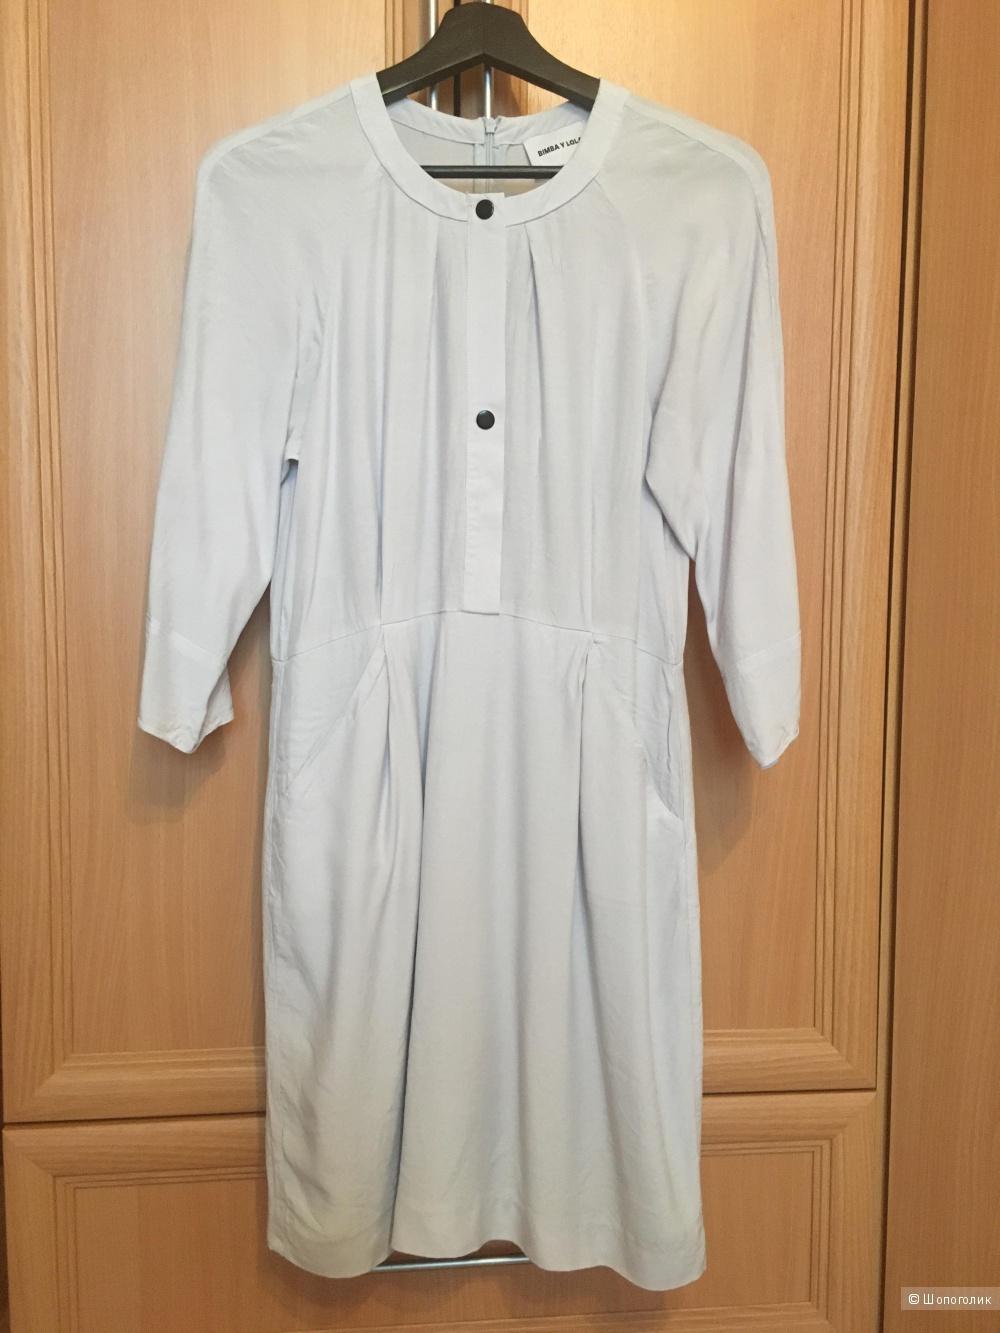 Голубое платье Bimba y lola размер S